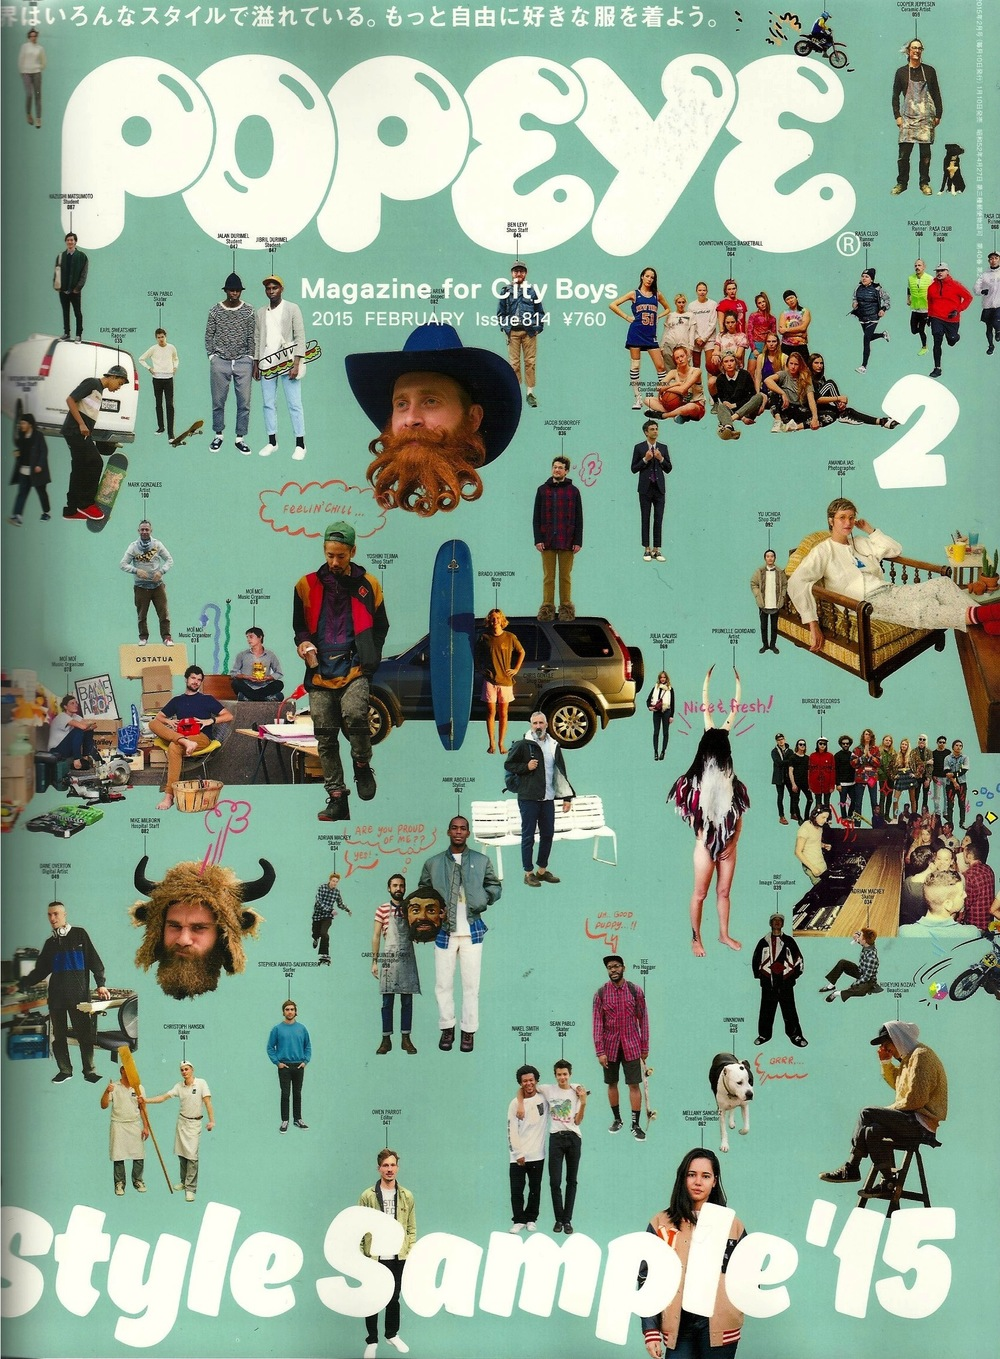 Popeye Magazine Old Joe Opening-1.jpg